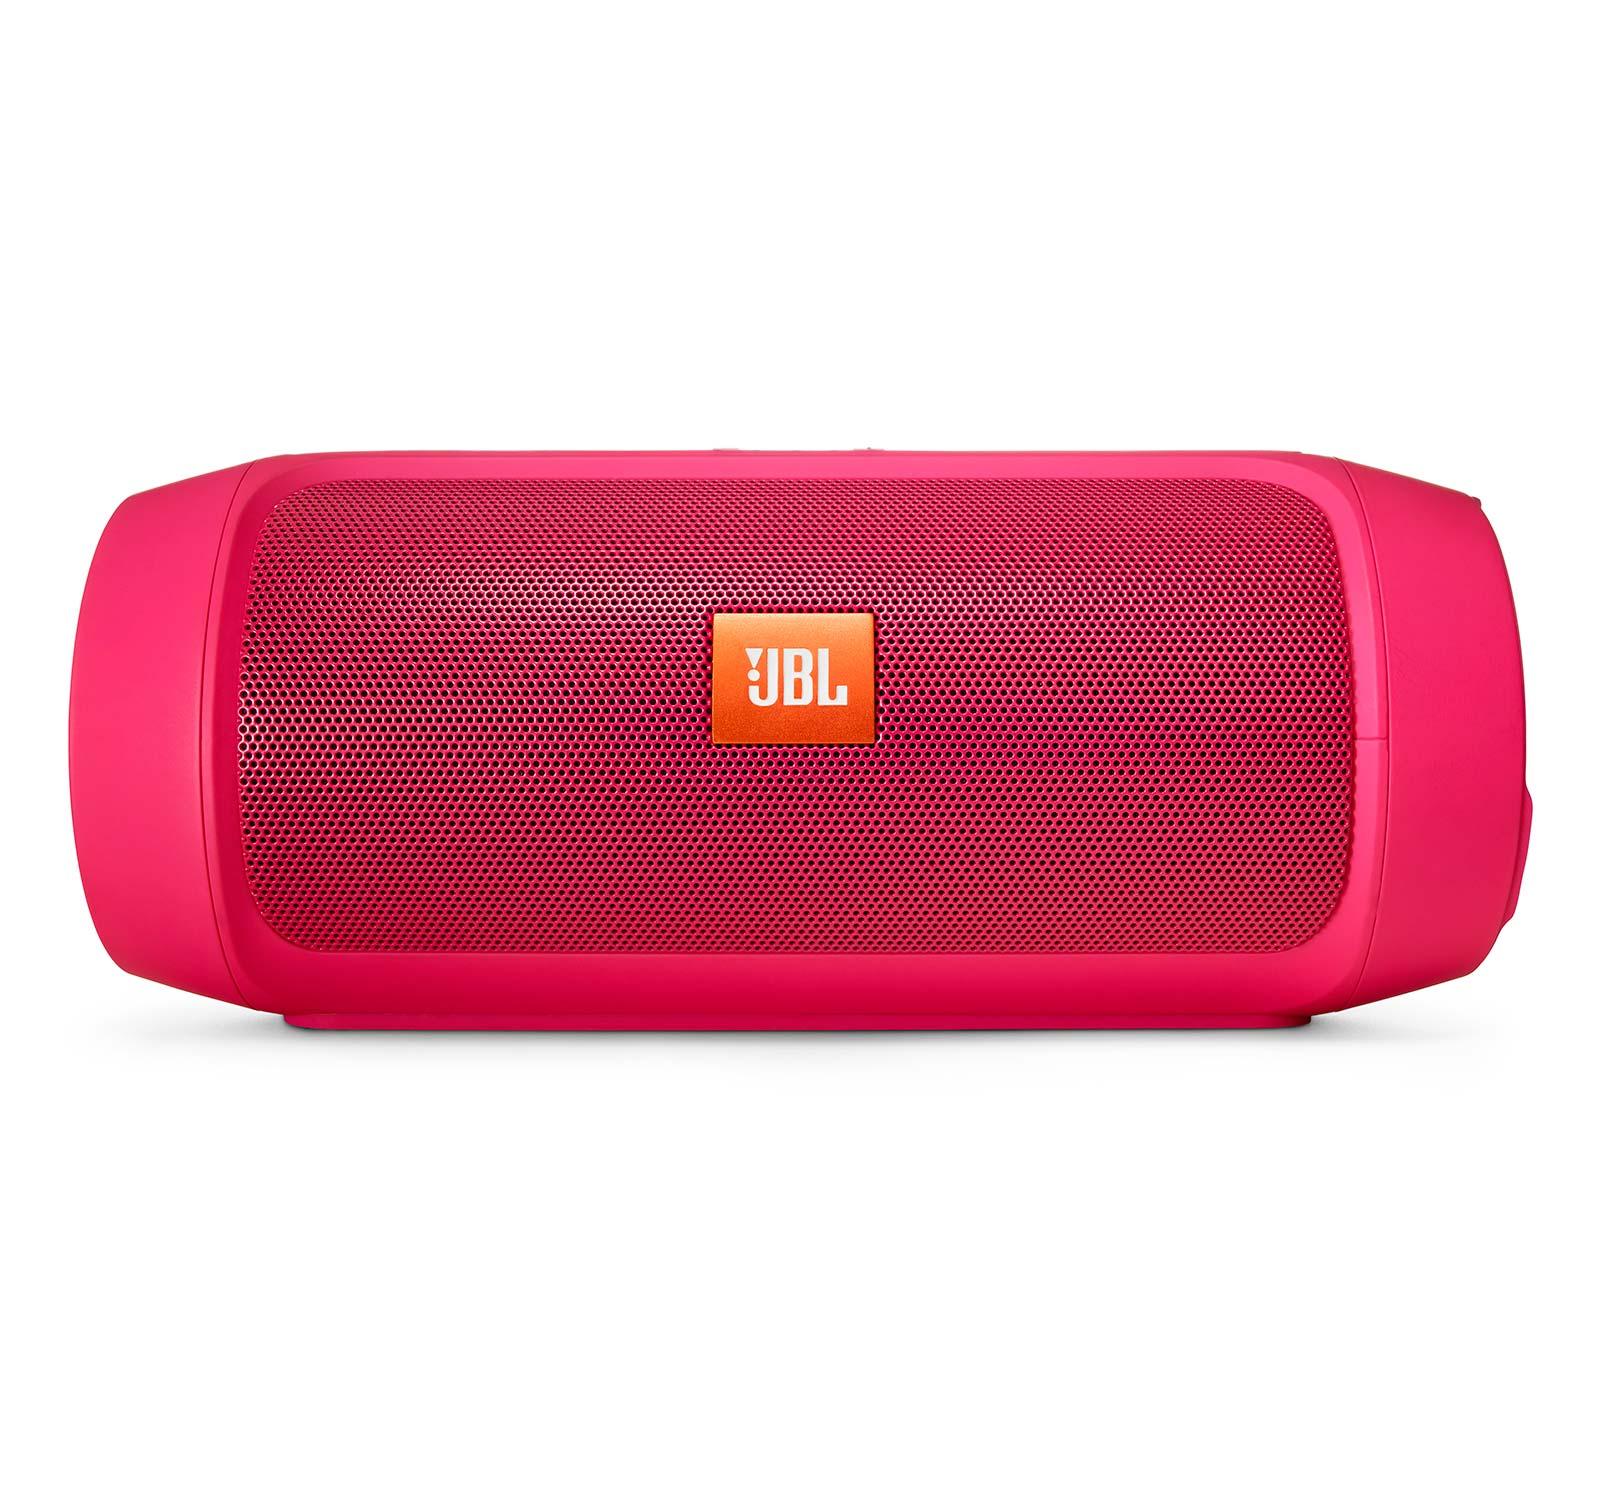 Portable Bluetooth Speaker Jbl Charge 2: JBL Charge 2 Plus Pink Splashproof Portable Bluetooth Speaker